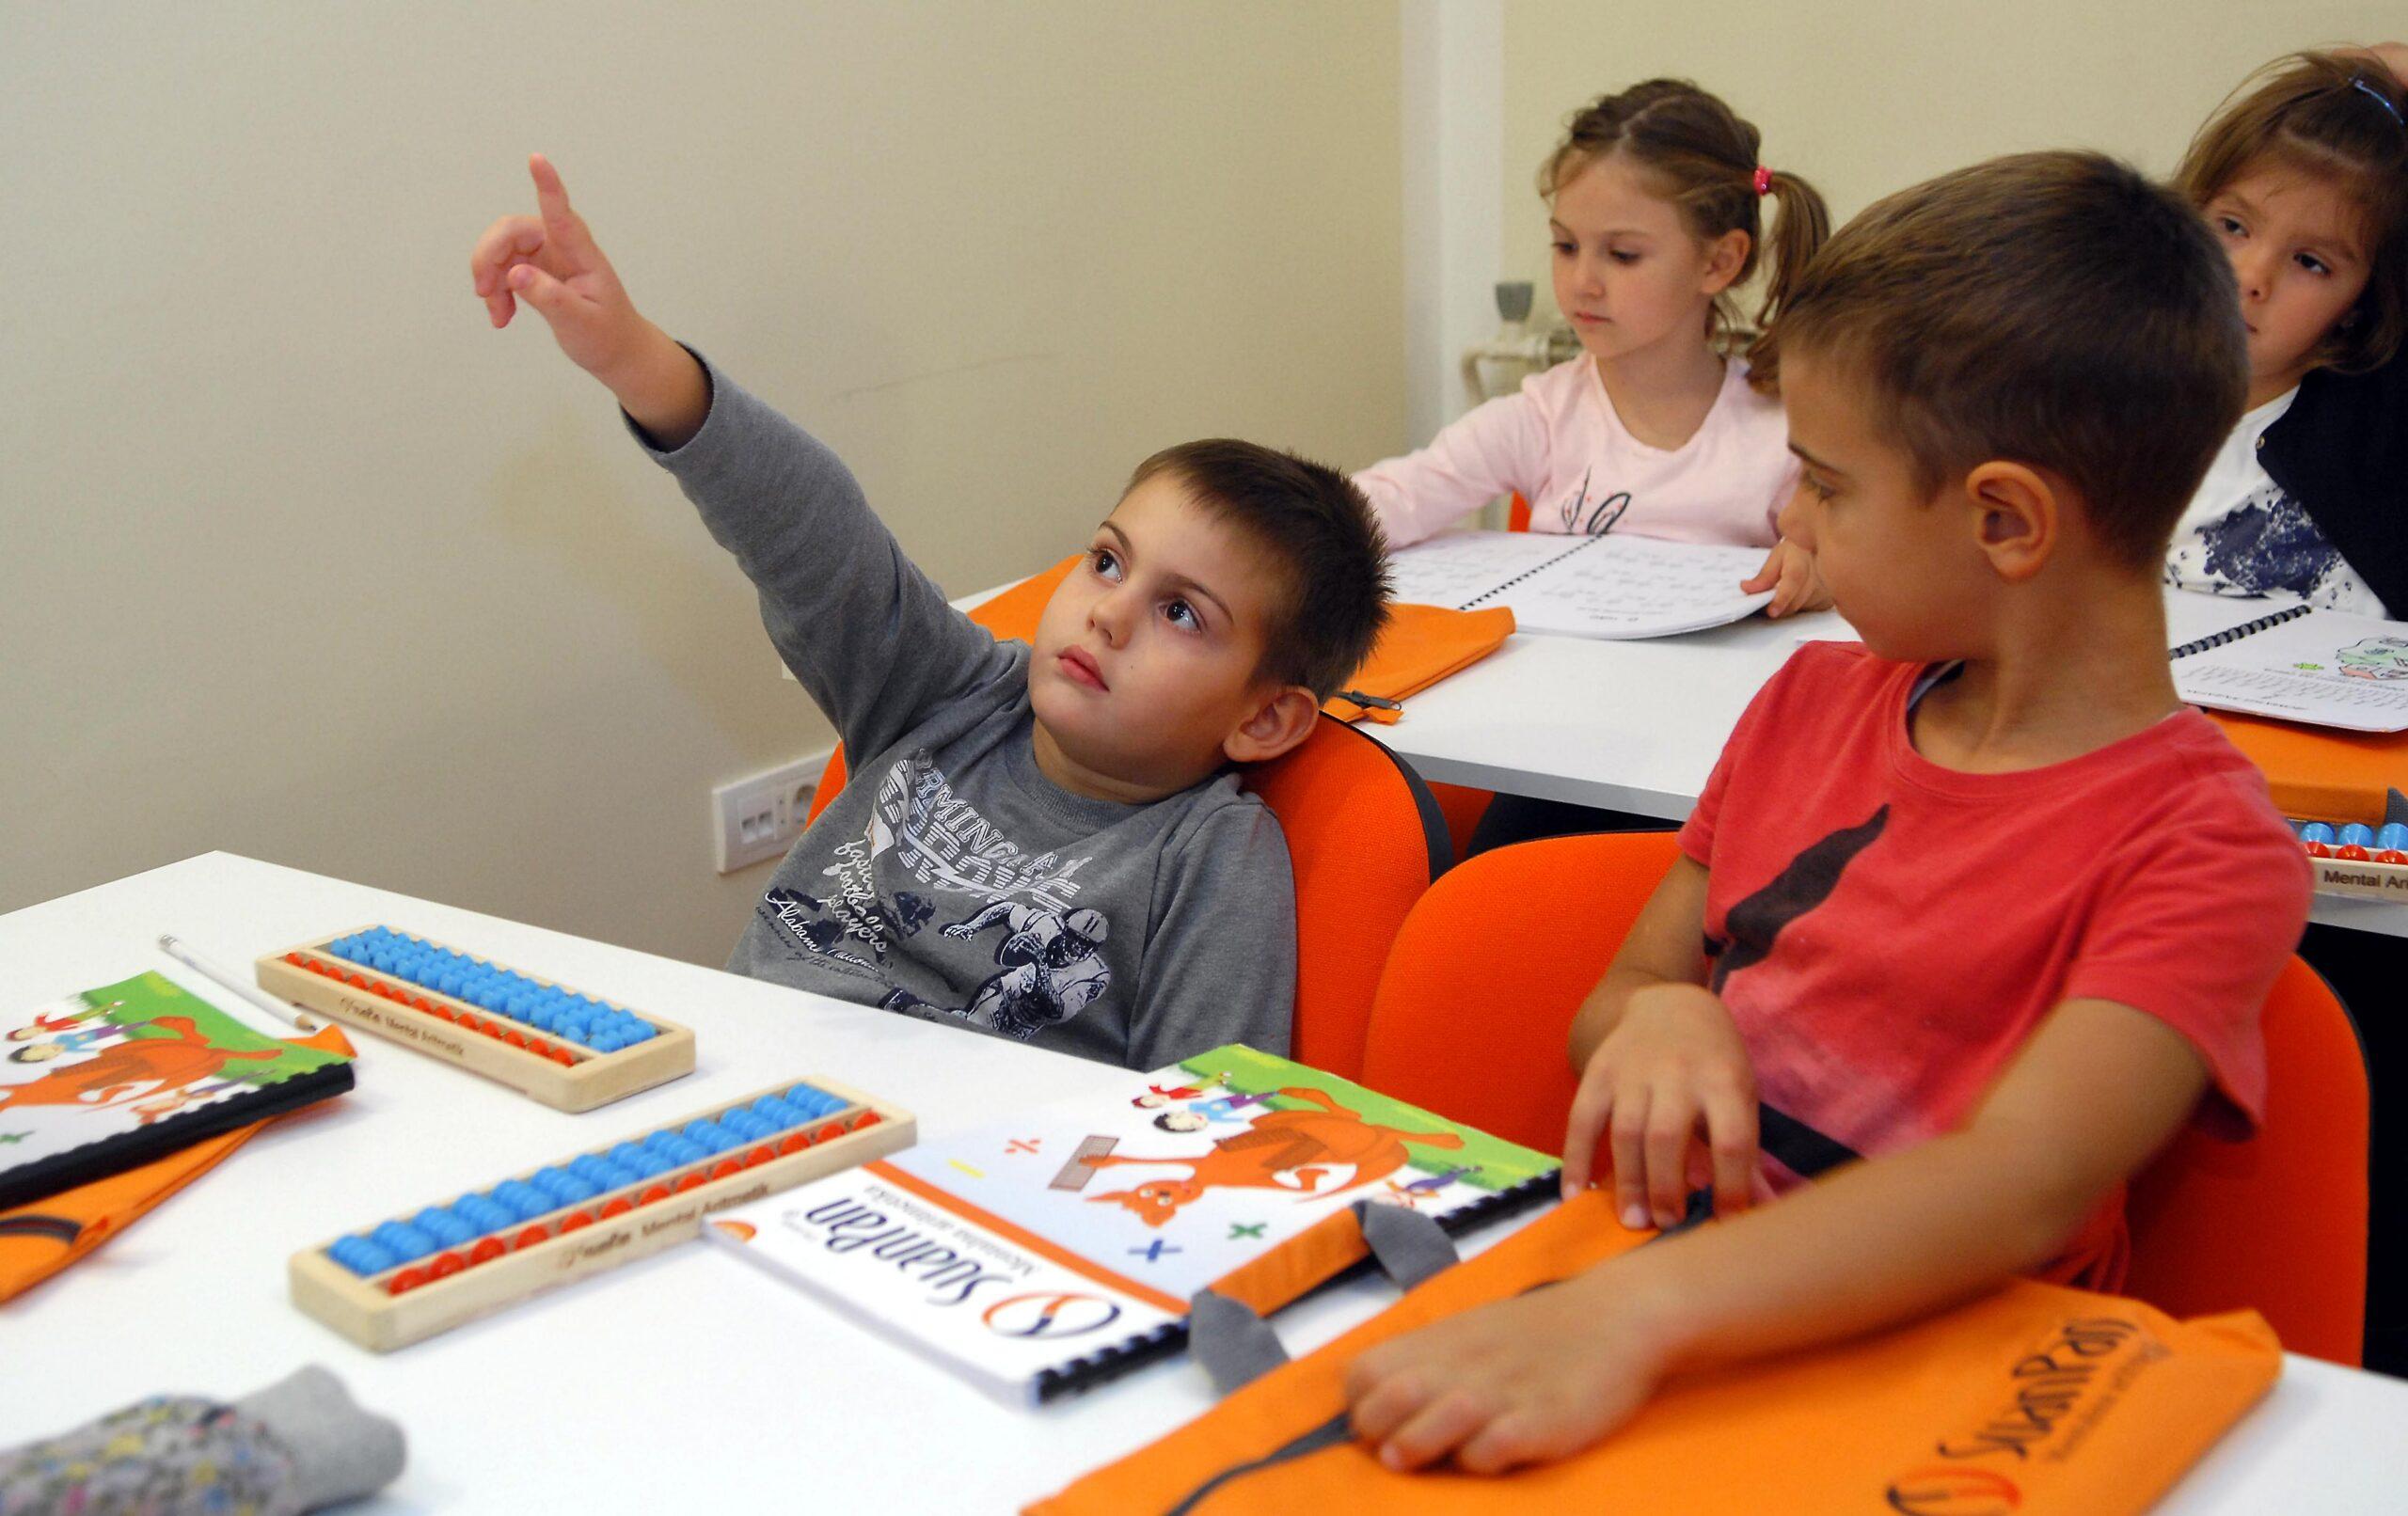 SuanPan-mentalna-aritmetika-iz-ugla-nauke-Uticaj-abakusa-I-mentalne-aritmetike-na-podsticanje-decije-inteligencije-Smartacus-obrazovni-centar